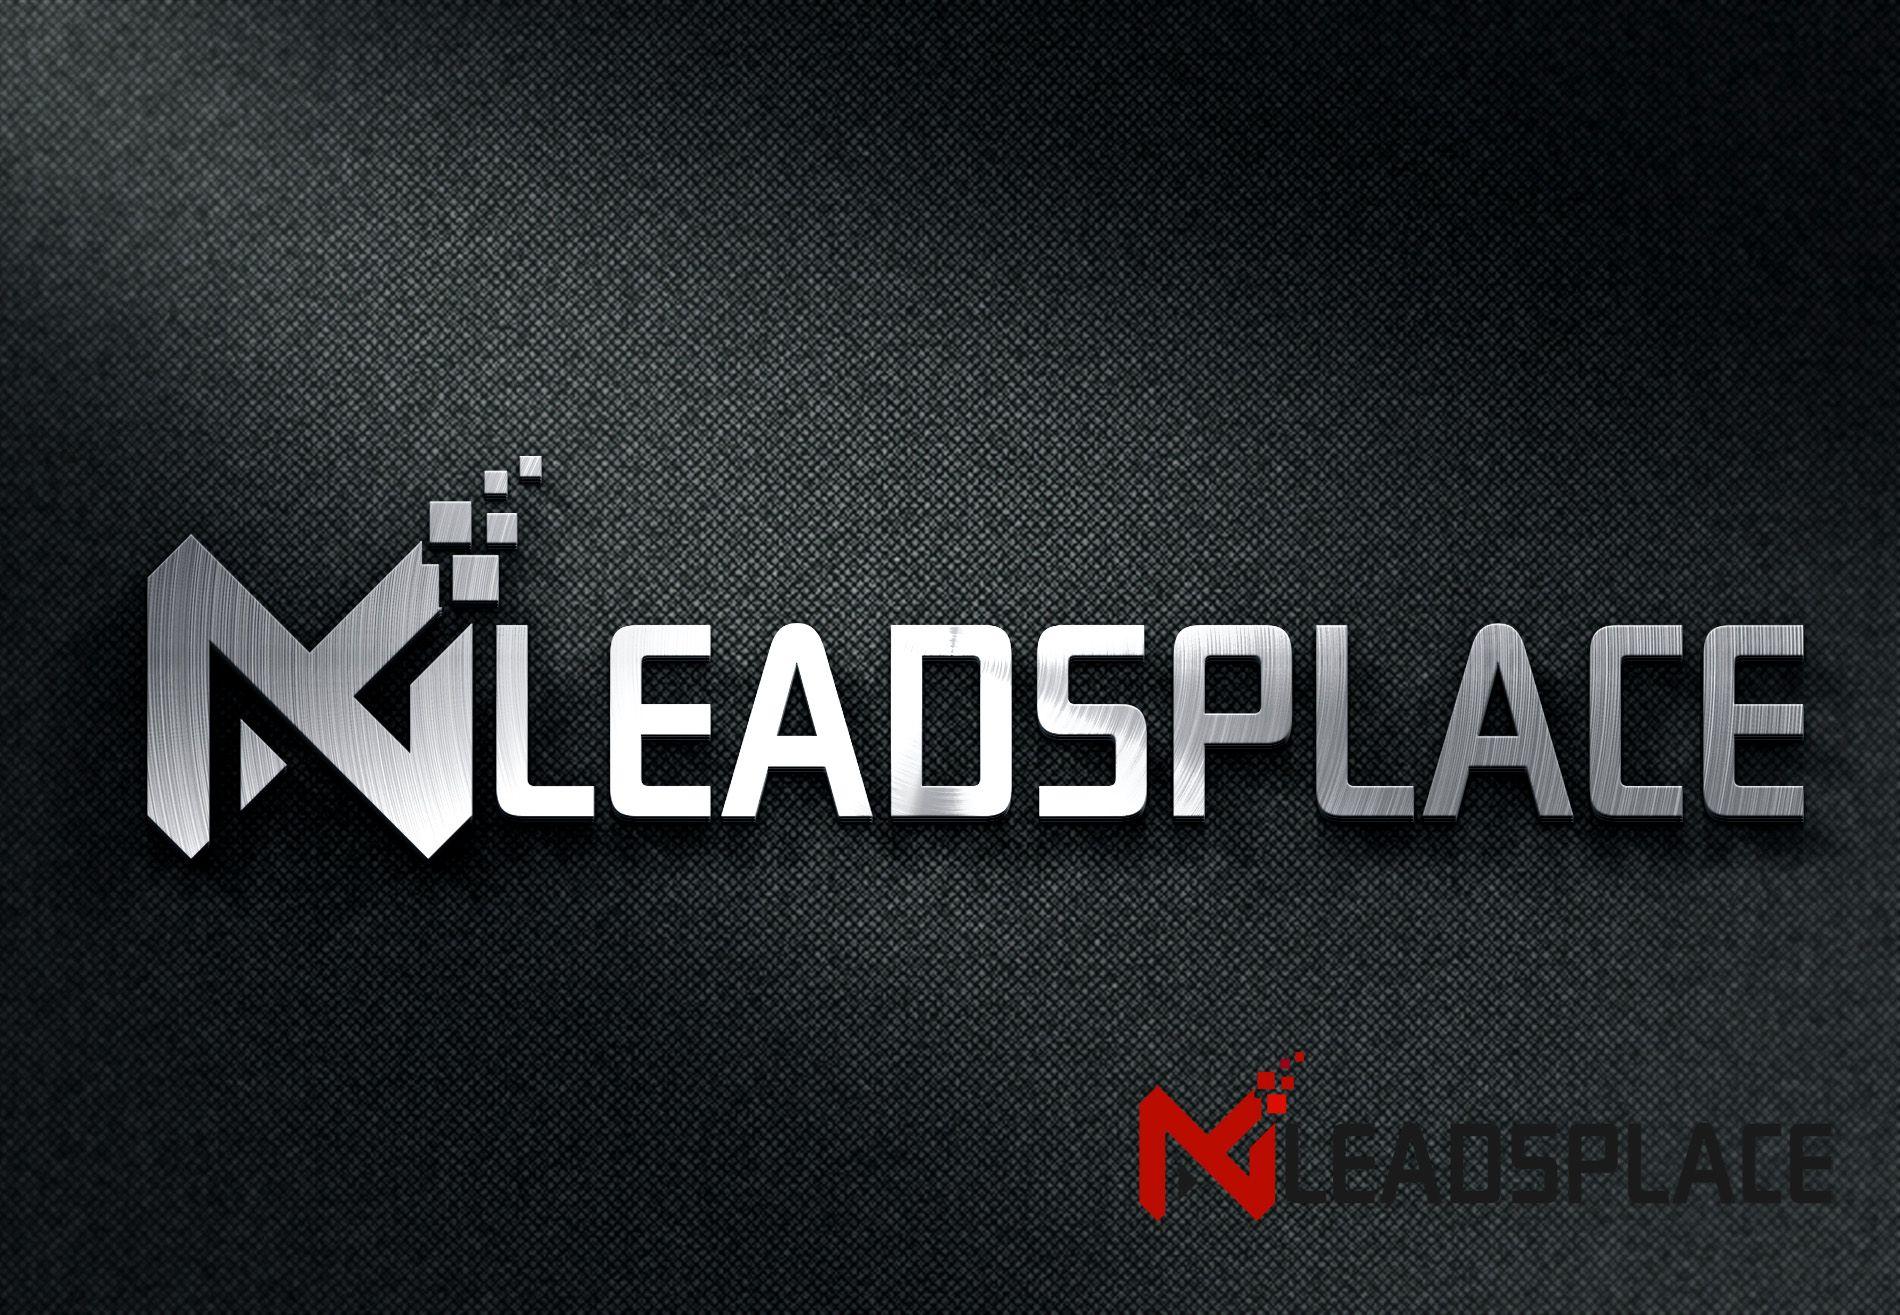 leadsplace.com - логотип - дизайнер La_persona